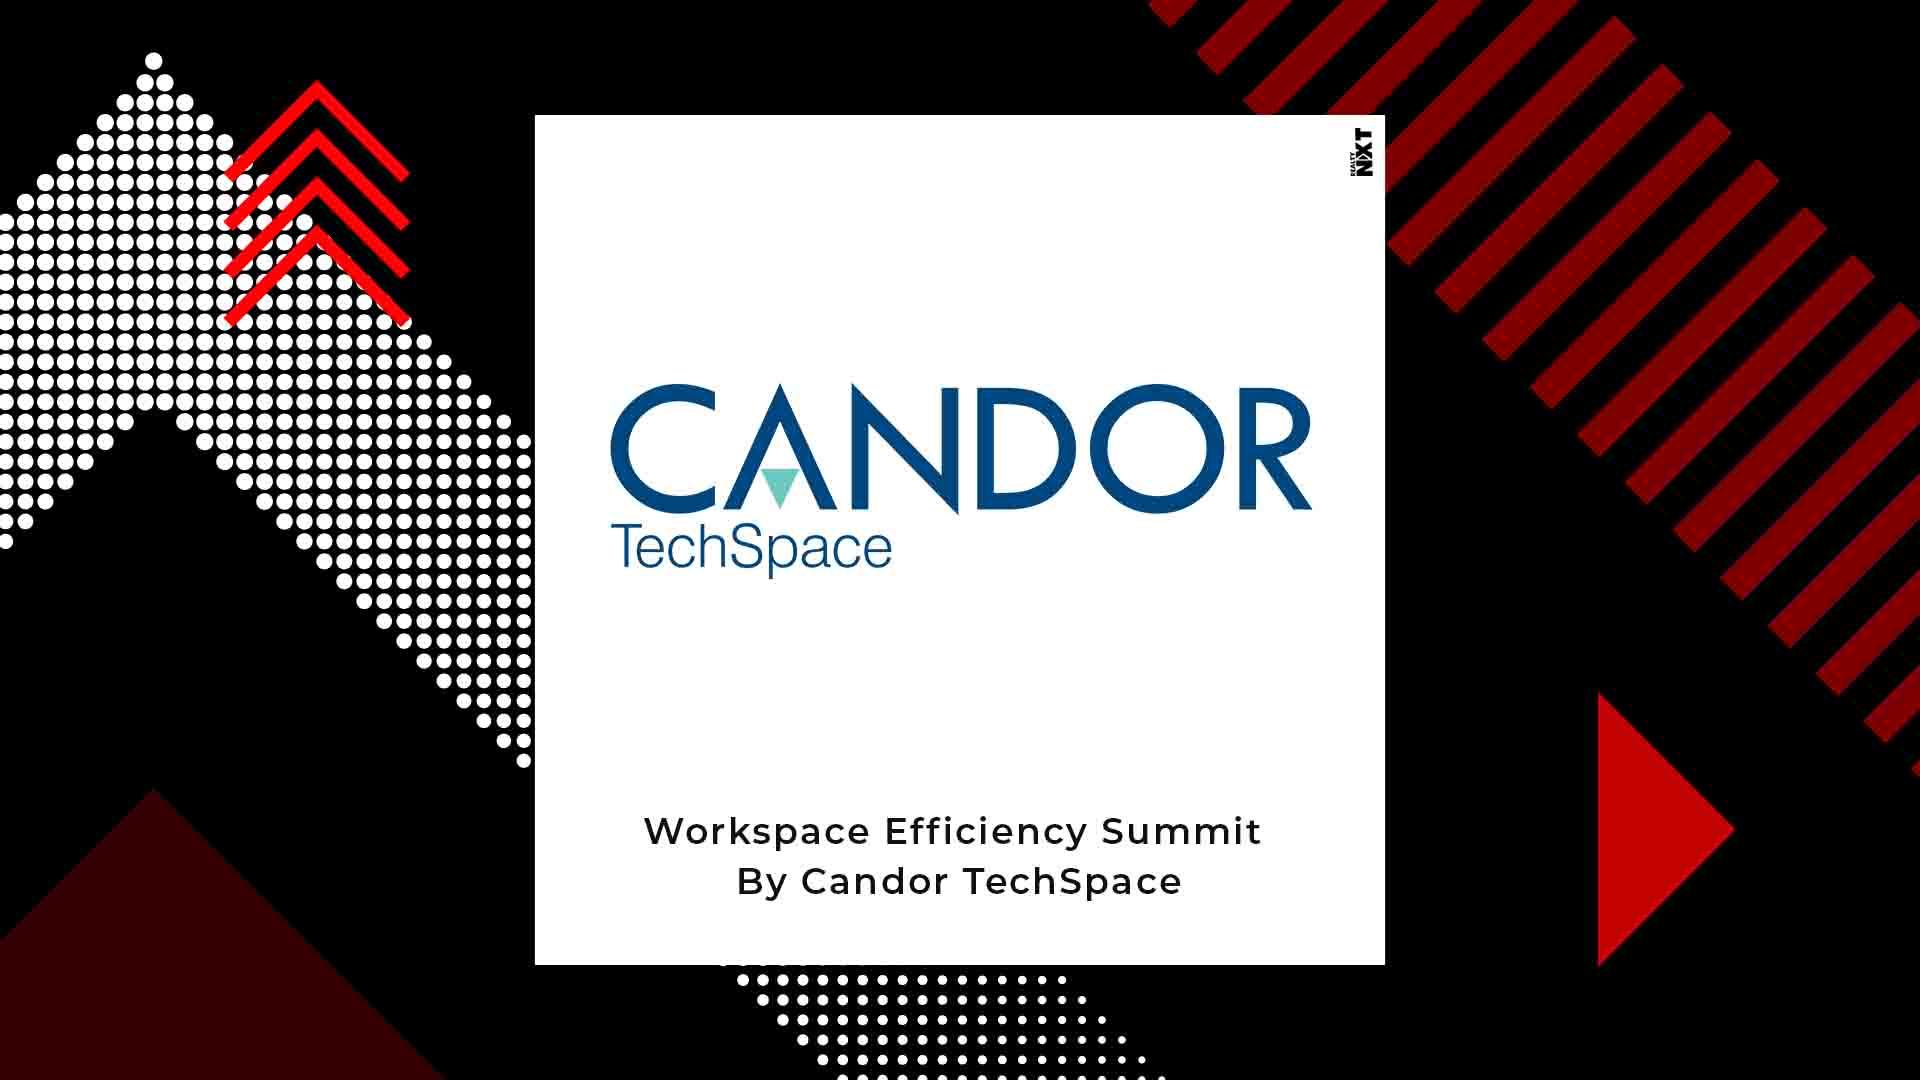 Candor TechSpace Organises Workspace Efficiency Summit